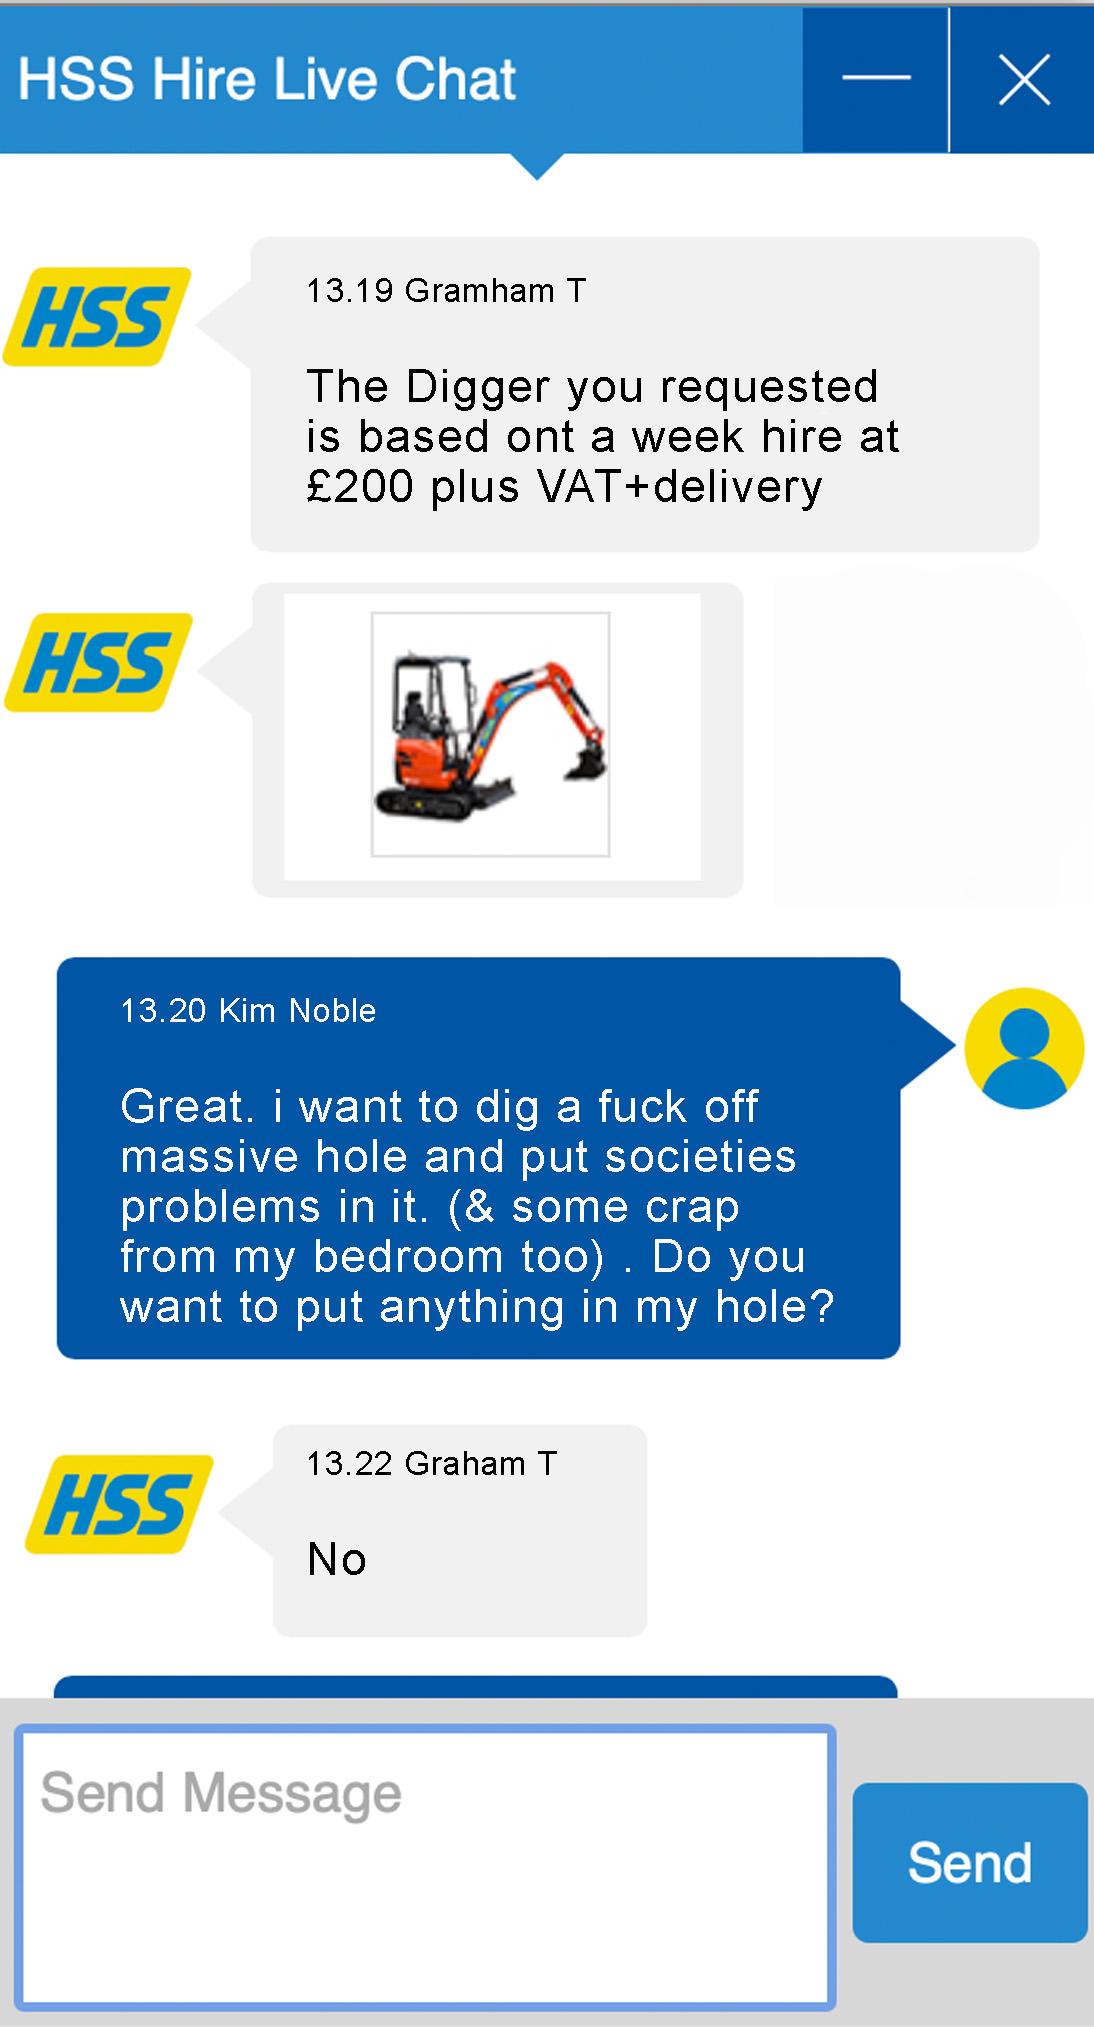 A Conversation about a hole